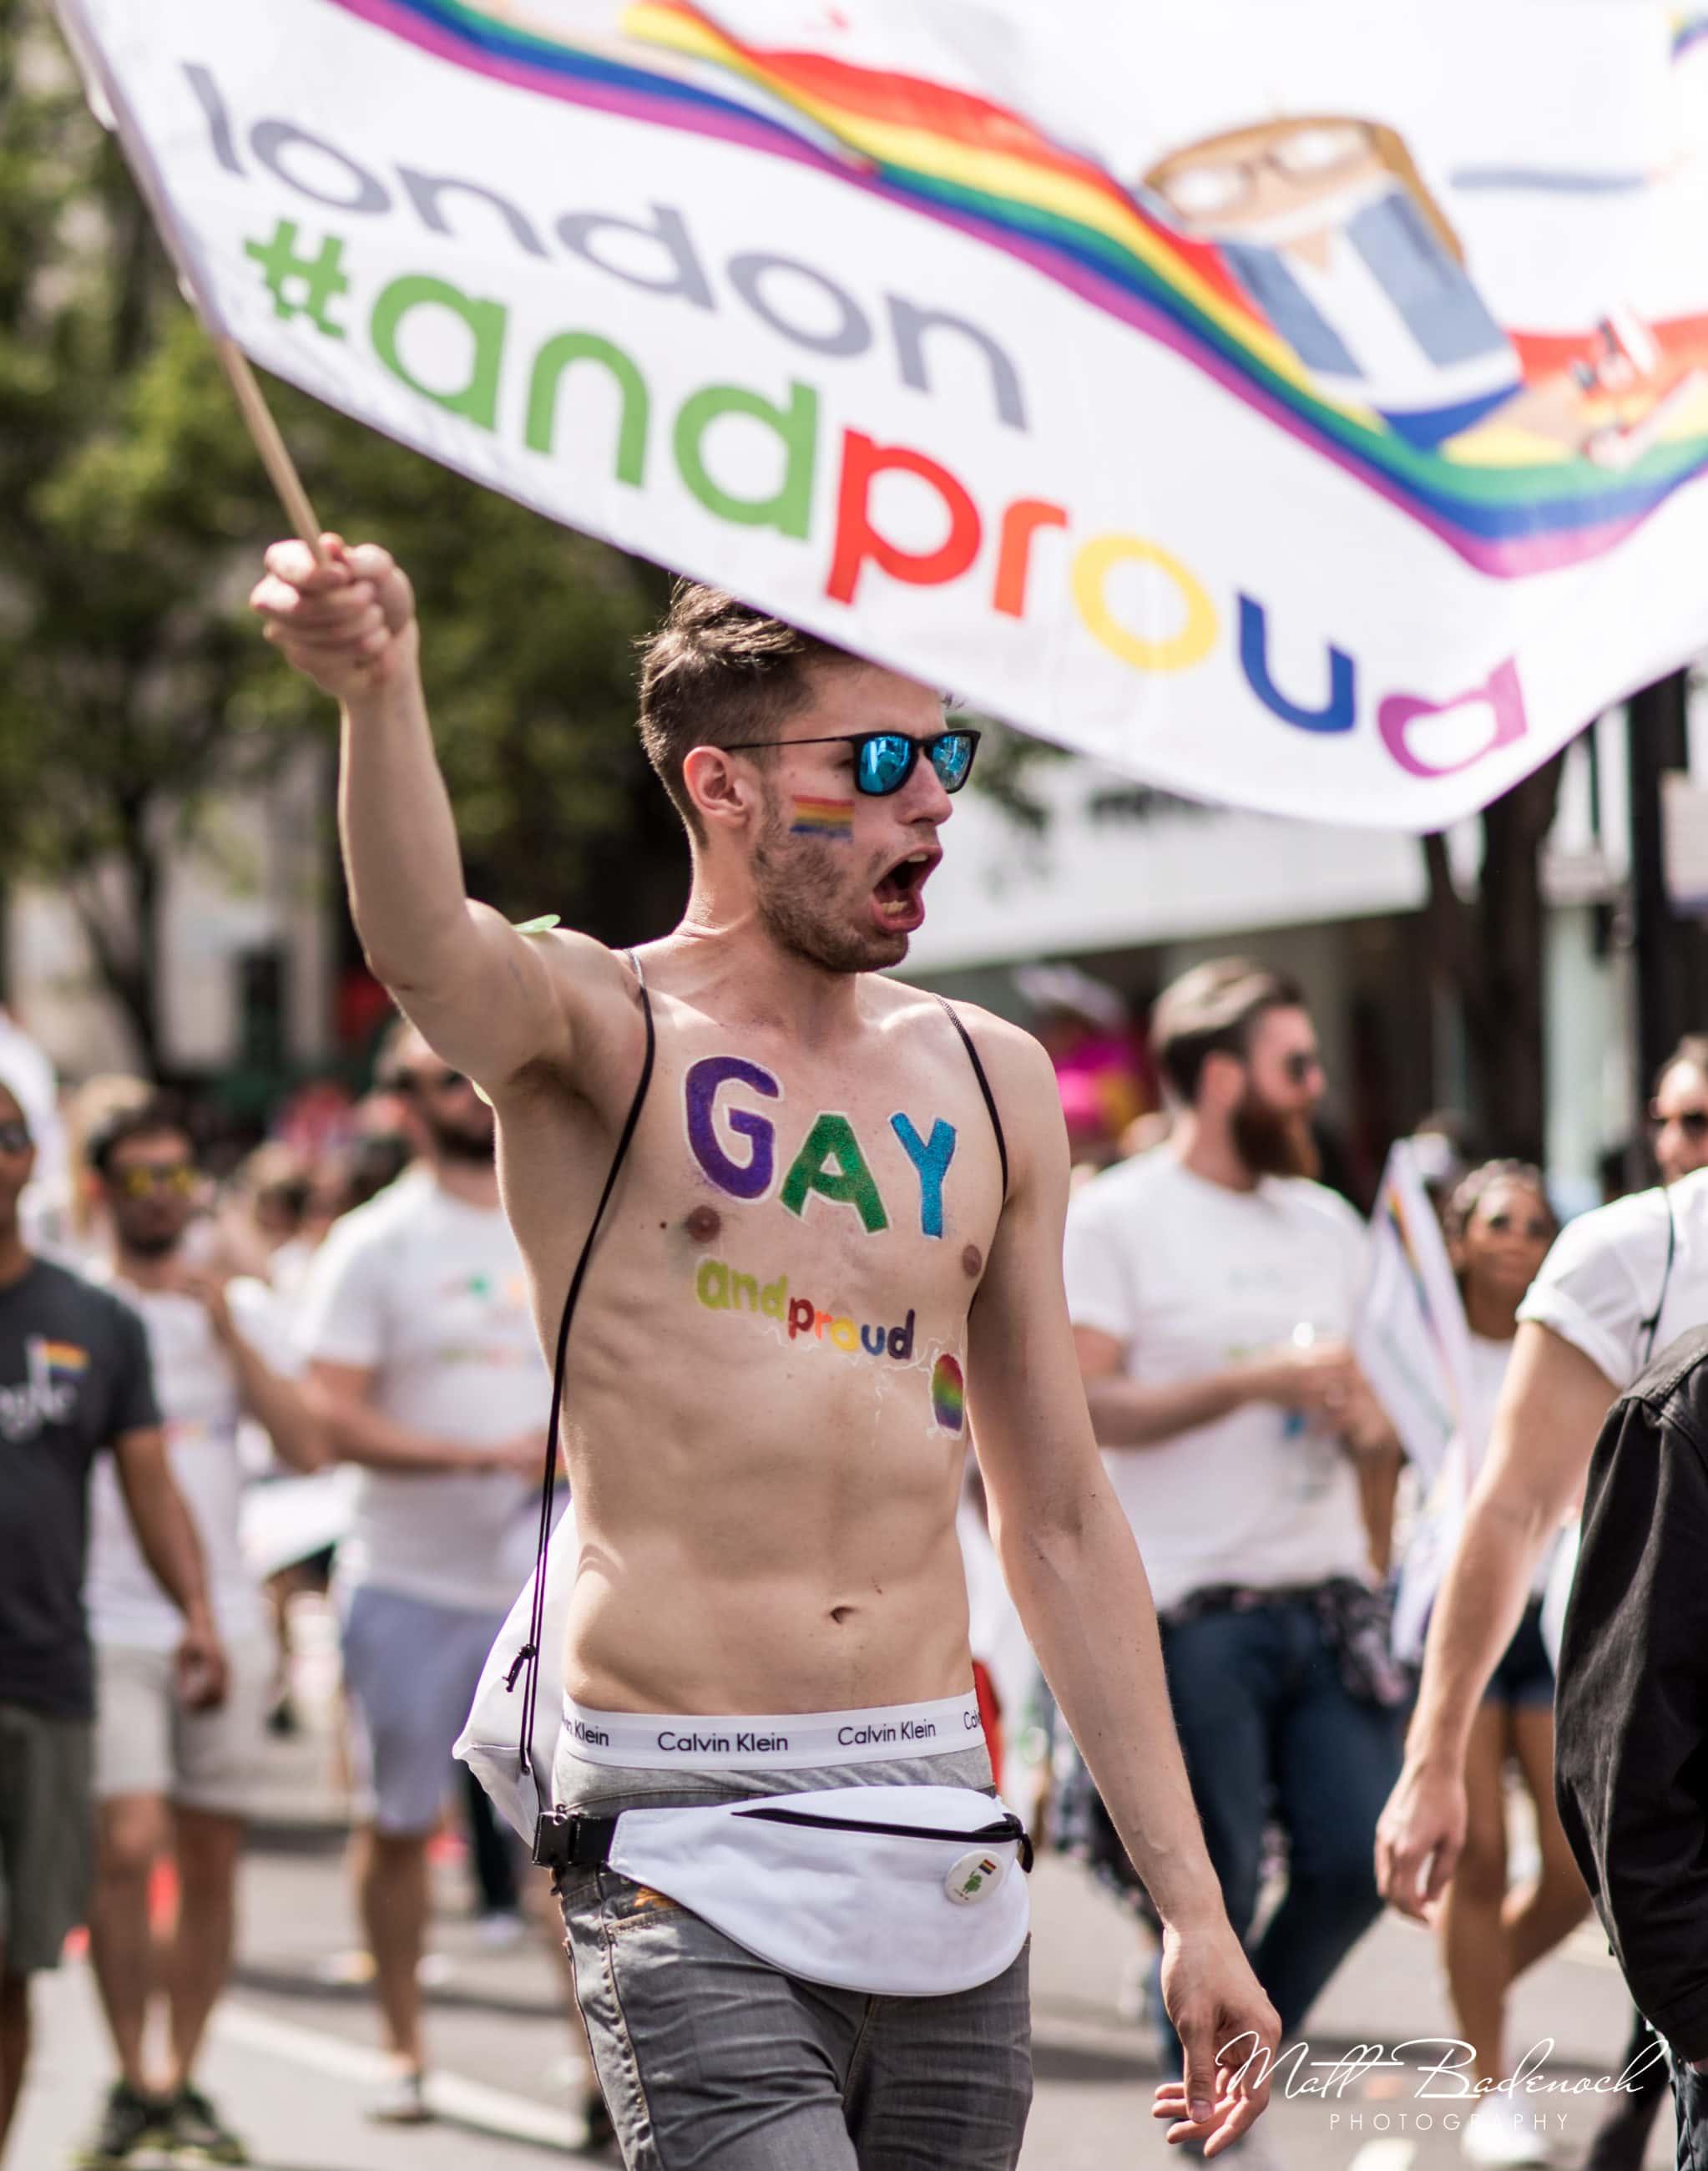 Google, London Pride Parade 2015 Photos